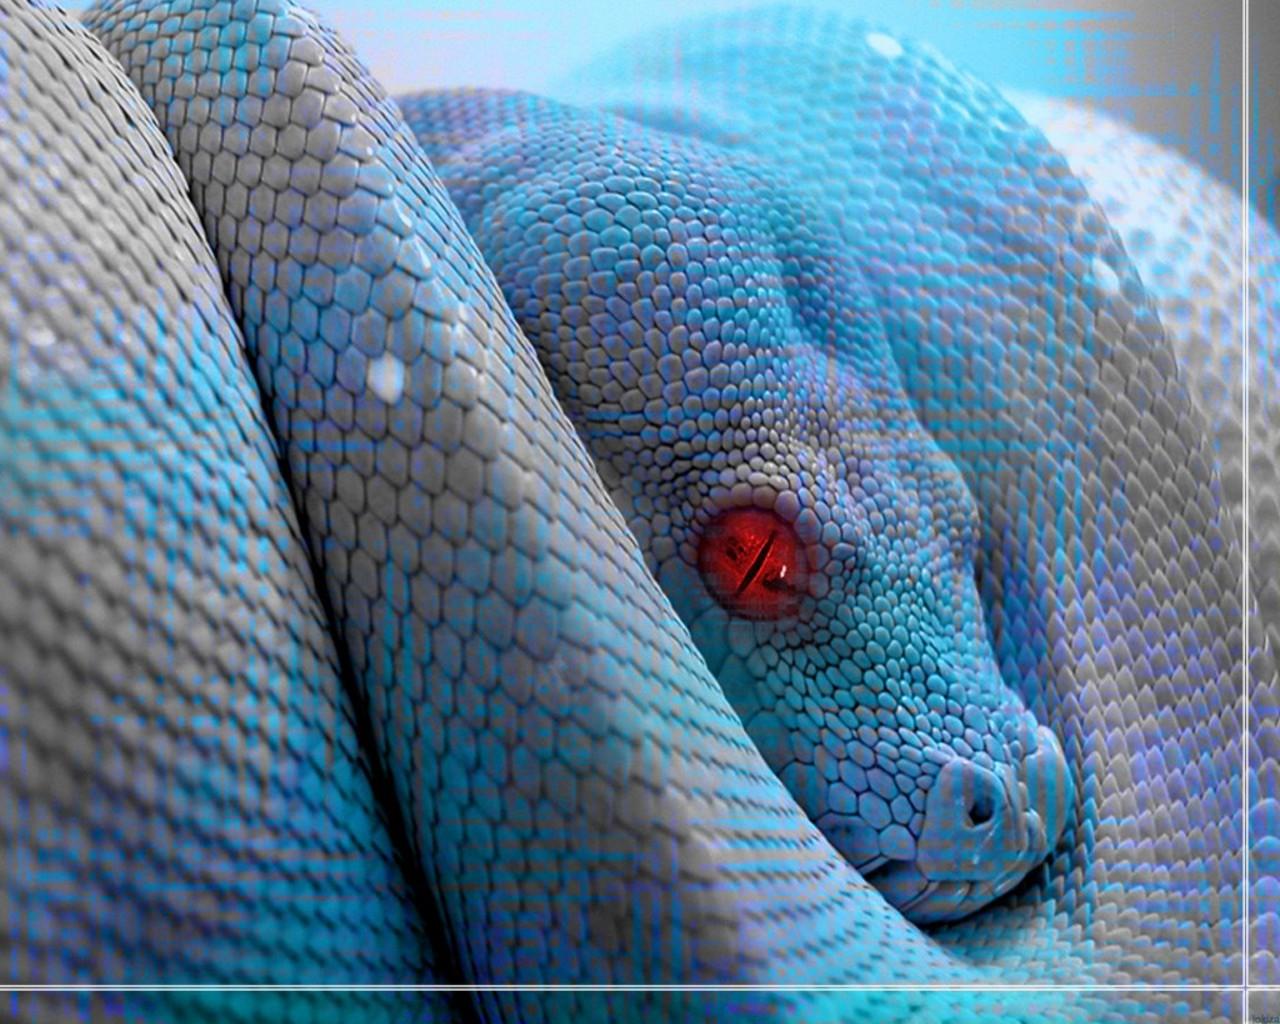 http://1.bp.blogspot.com/-Gmy8AzJEsK0/UG9QIRfxC9I/AAAAAAAAETY/FtdE6ZmK9BE/s1600/animals_reptiles-blue-snake-wallpaper_1.jpg